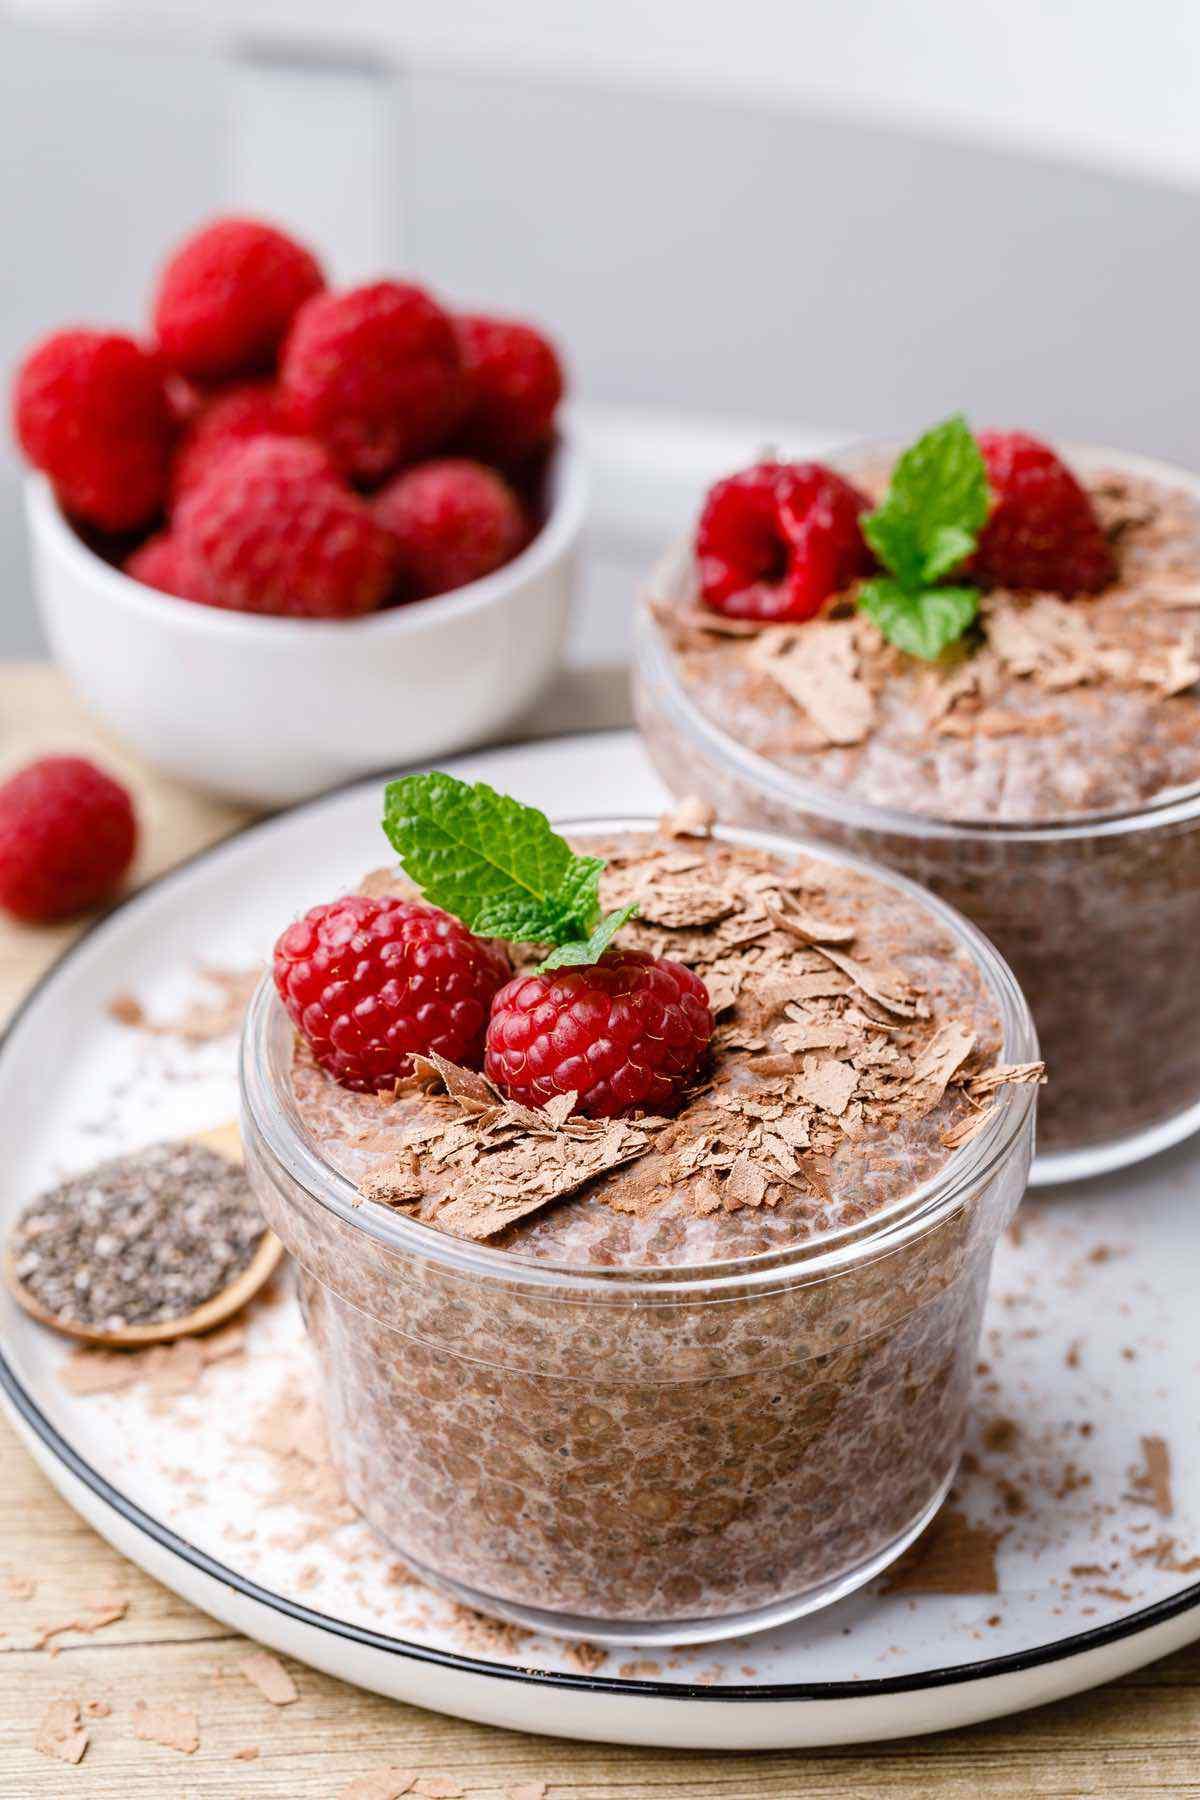 Easy 4-Ingredient Chocolate Keto Chia Pudding